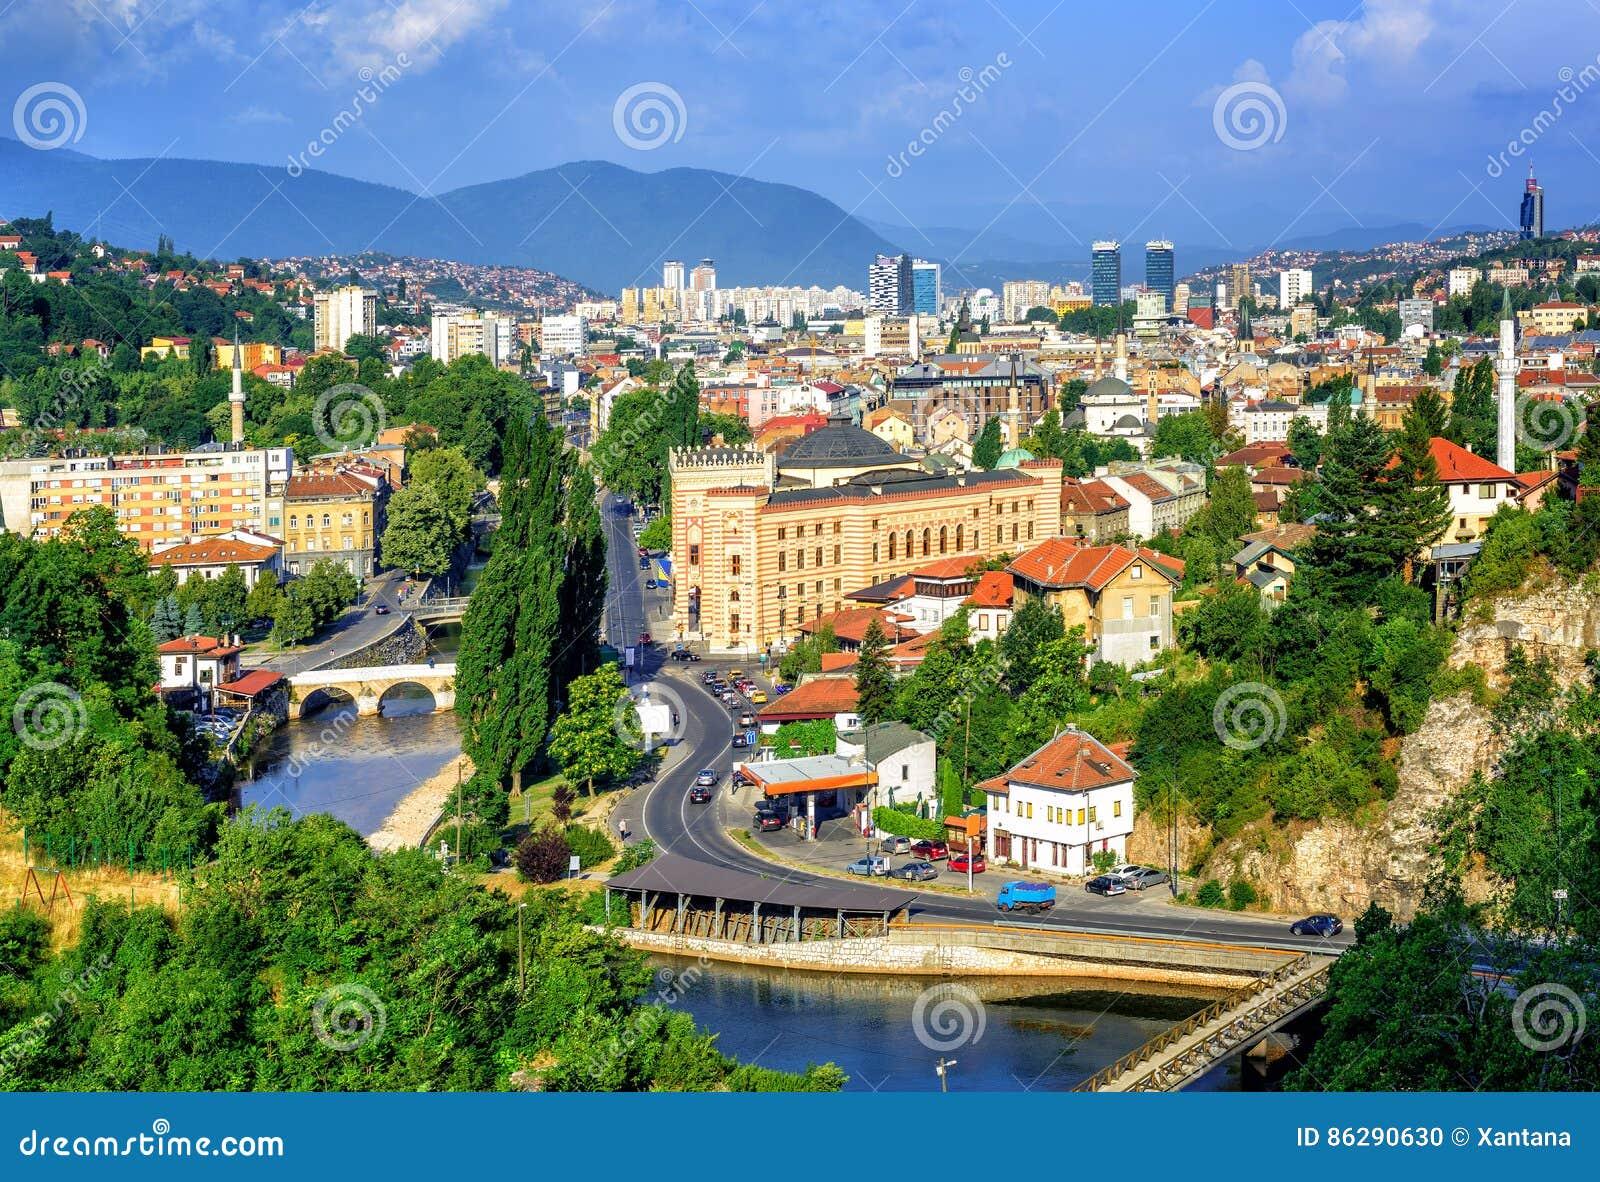 Ville de Sarajevo, capitale de la Bosnie-Herzégovine